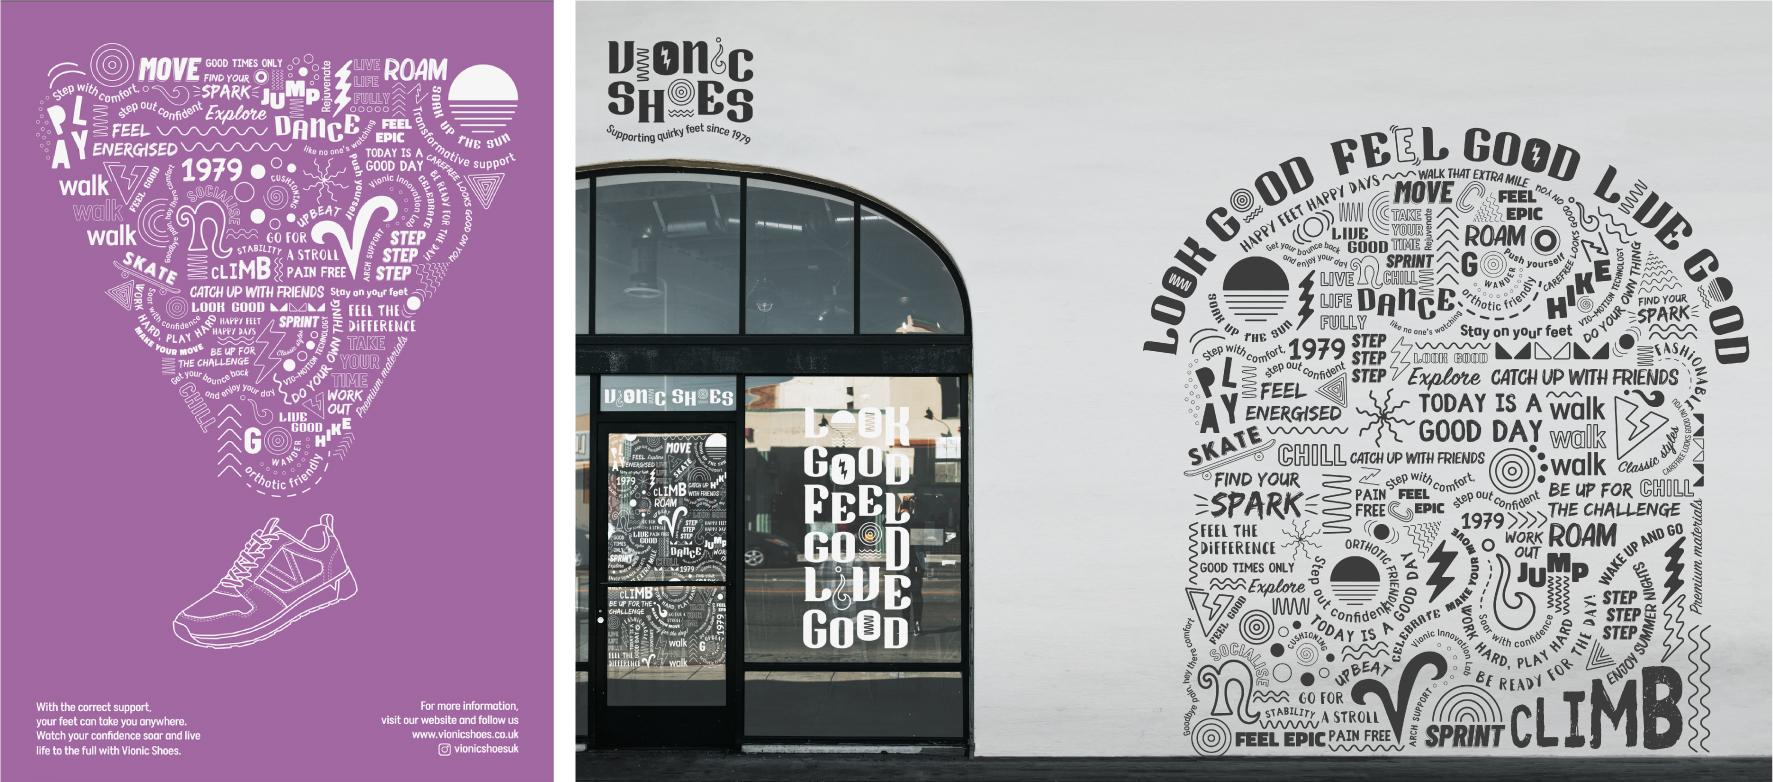 Vionic Shoes Rebrand